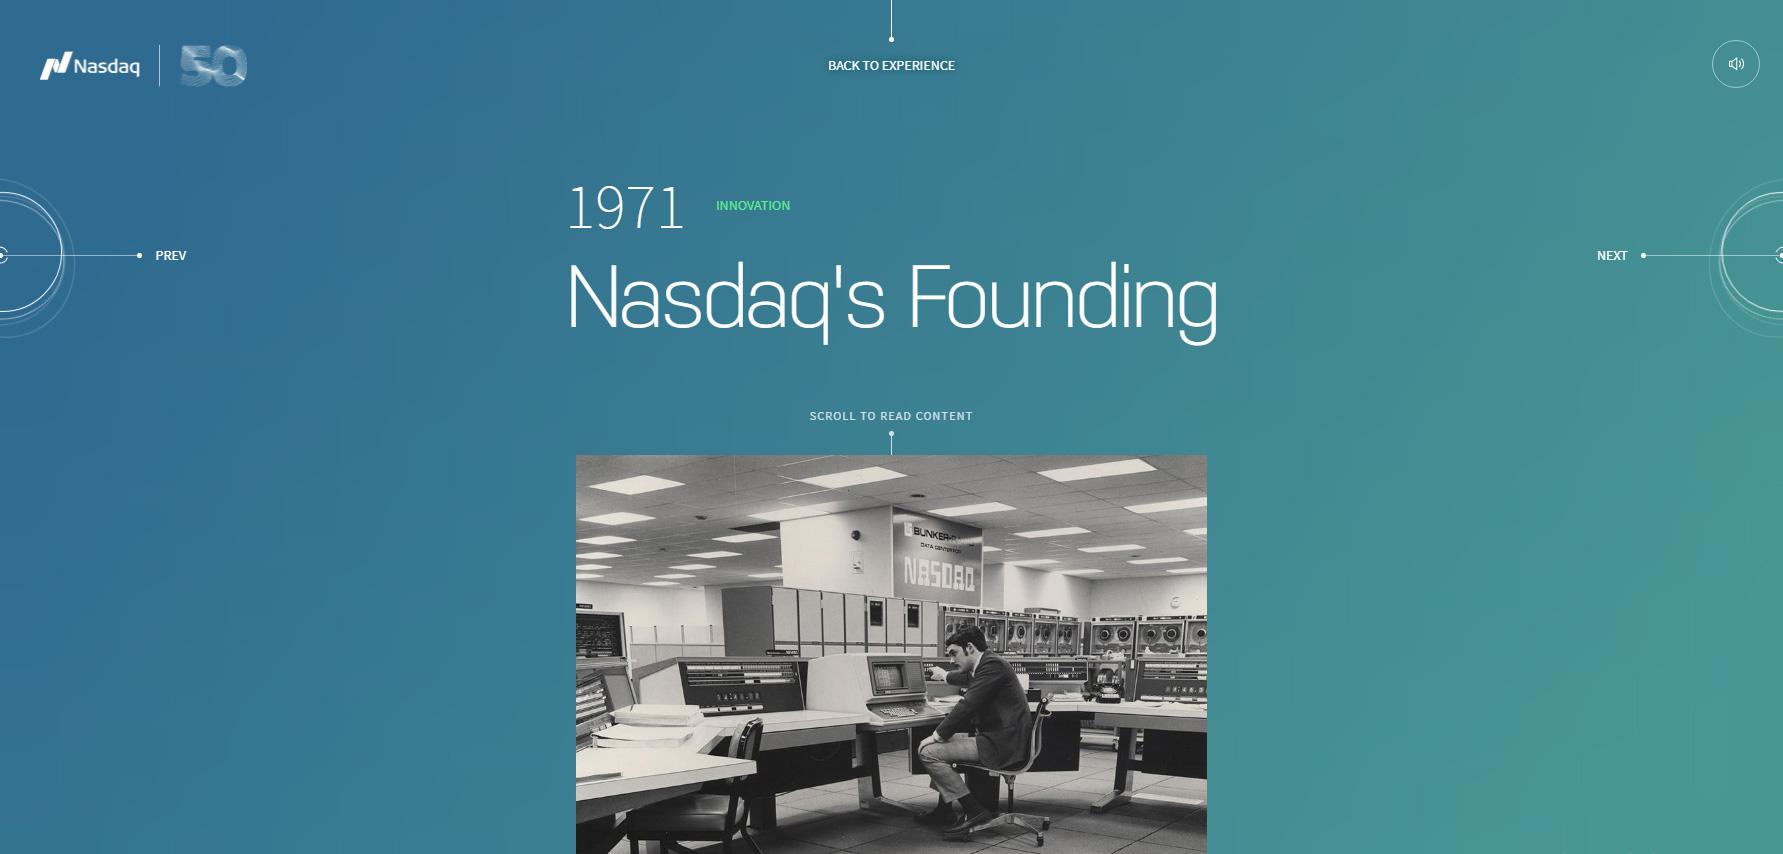 Nasdaq 50th anniversary - Website of the Day